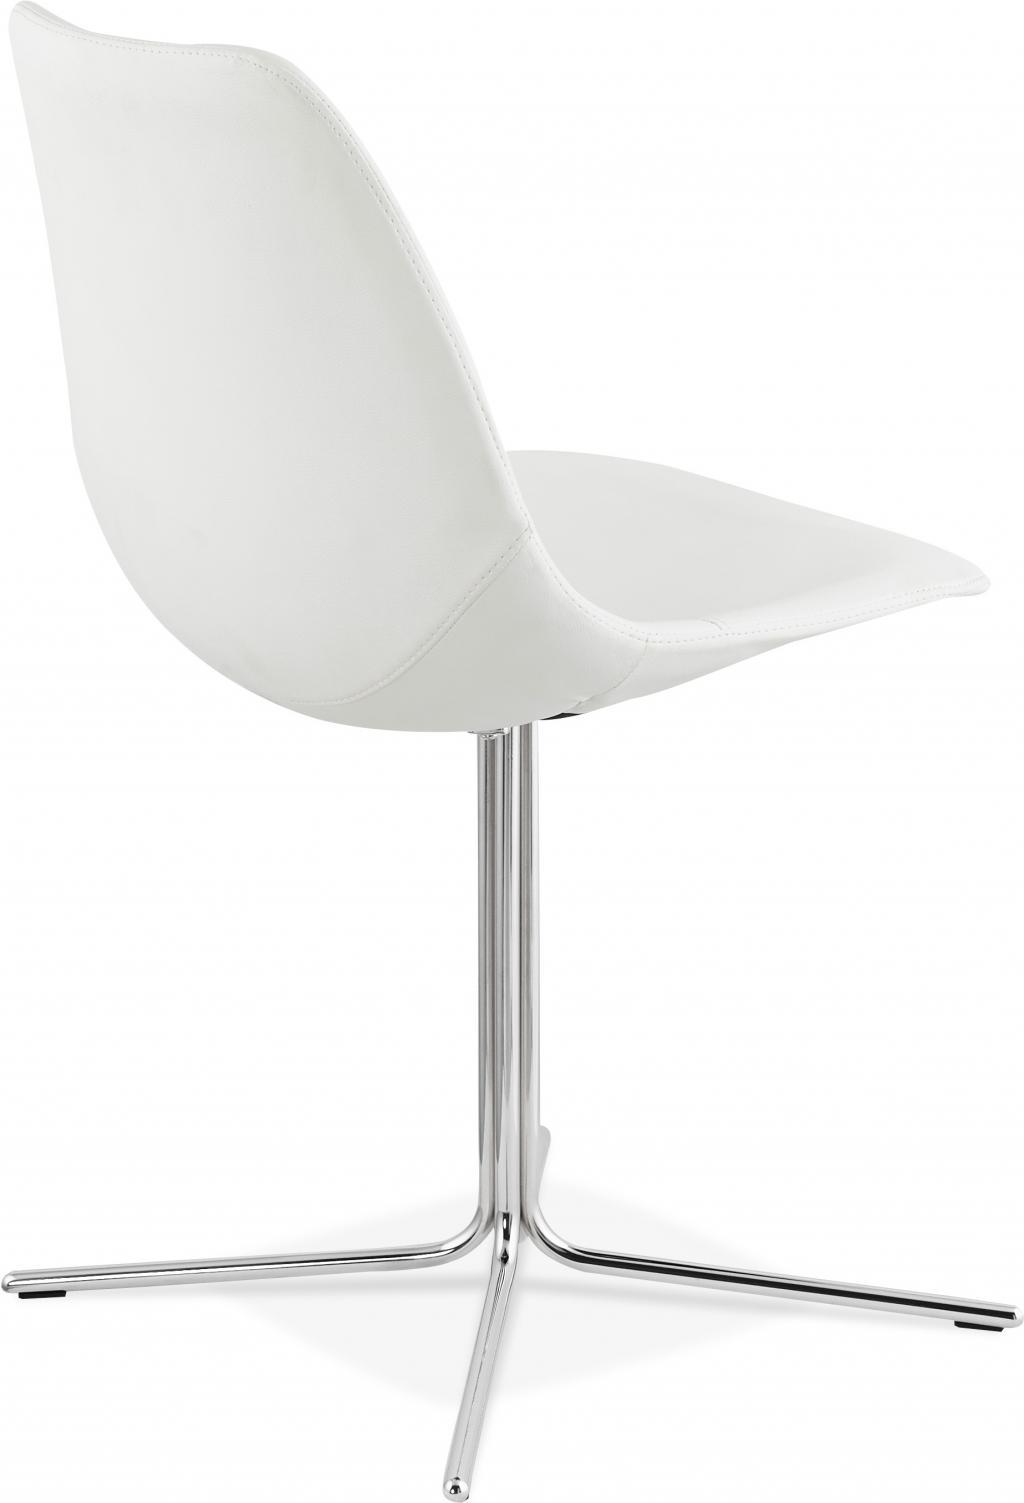 stuhl bedford wei chrom leder metall kokoon design kaufen wohn. Black Bedroom Furniture Sets. Home Design Ideas